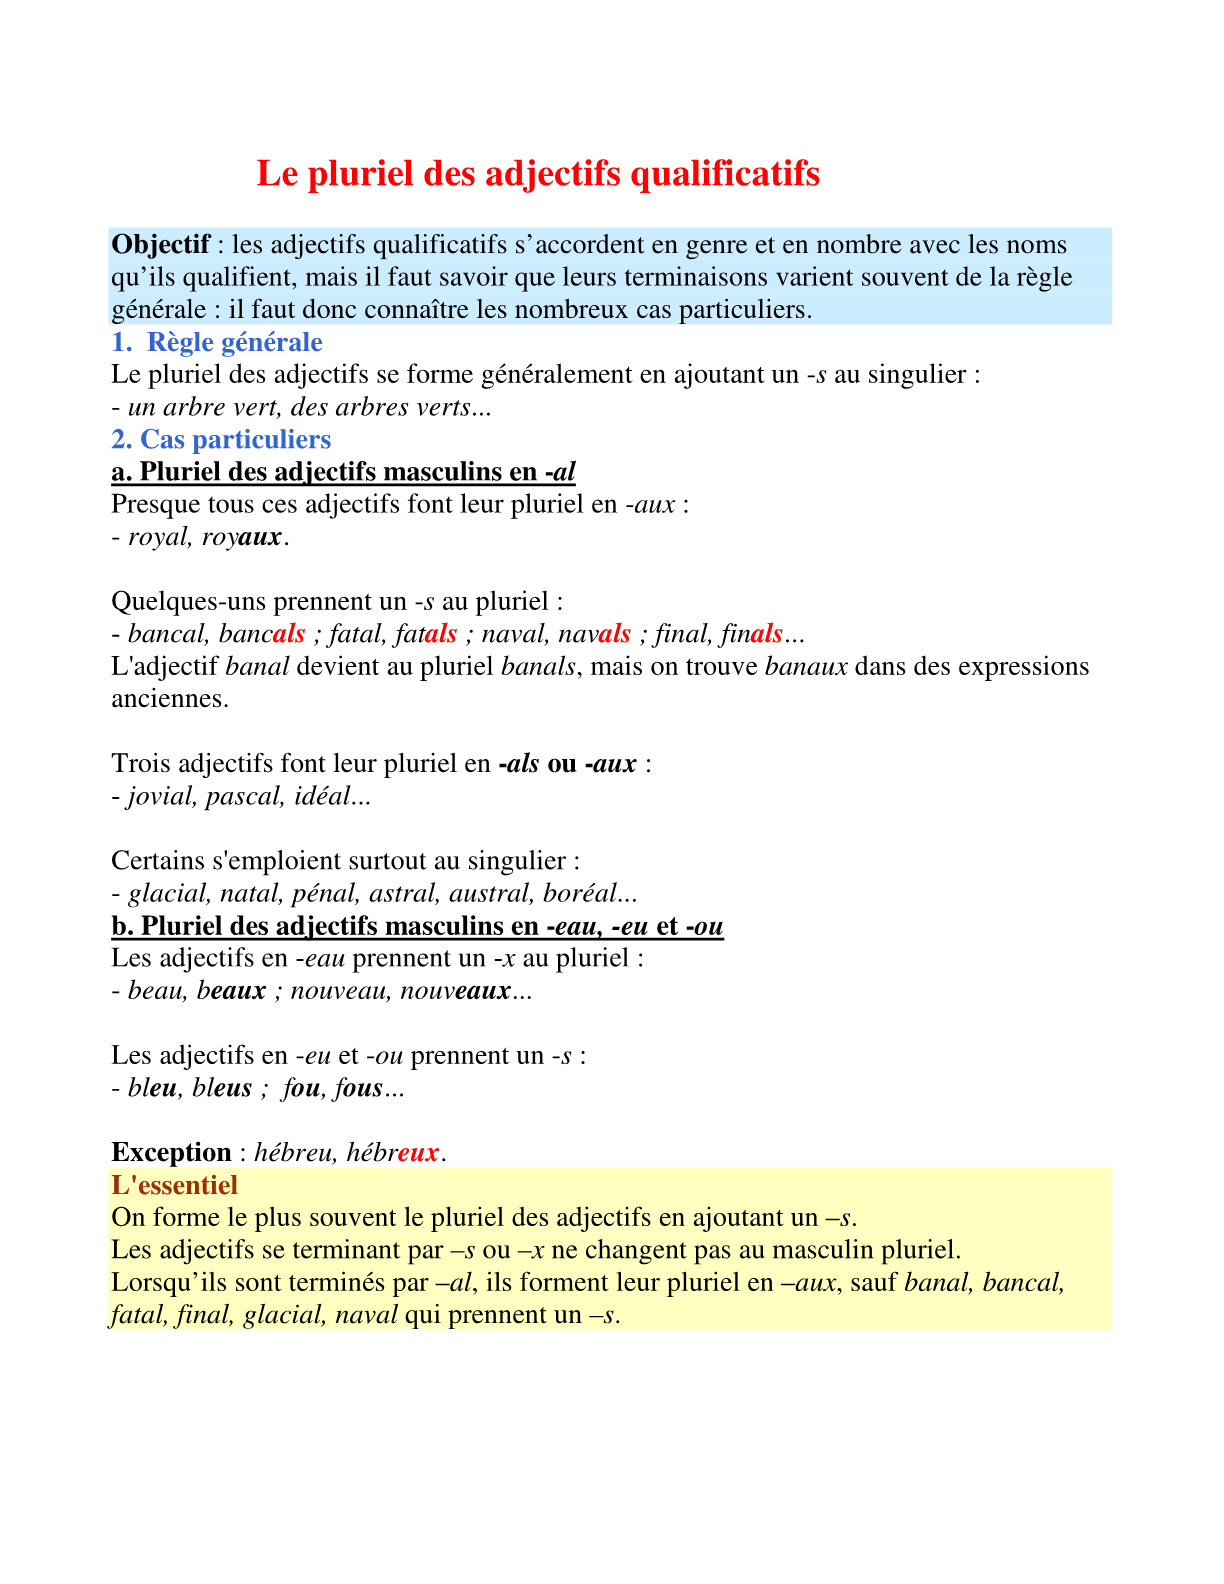 درس Le pluriel des adjectifs qualificatifs الأولى إعدادي